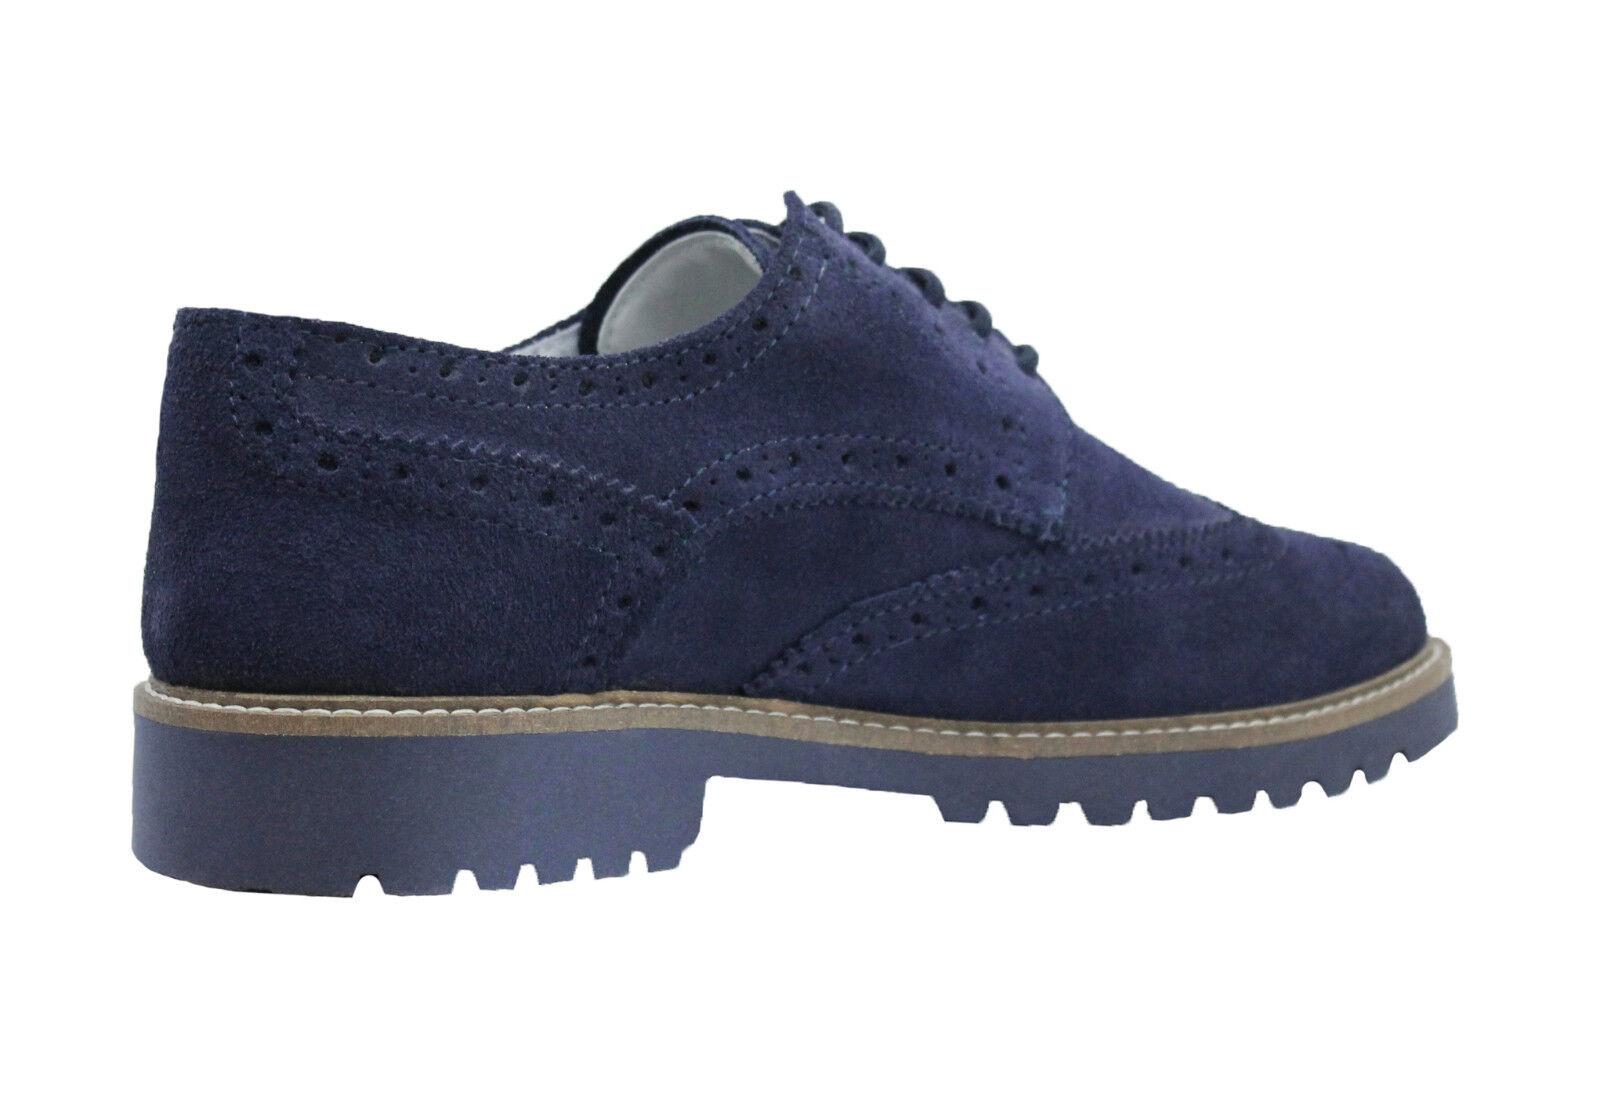 Zapatos FRANCESINE hombre DIAMOND CASUAL ELEGANTI BLU BLU BLU CAMOSCIO 100% MADE IN ITALY 064a55